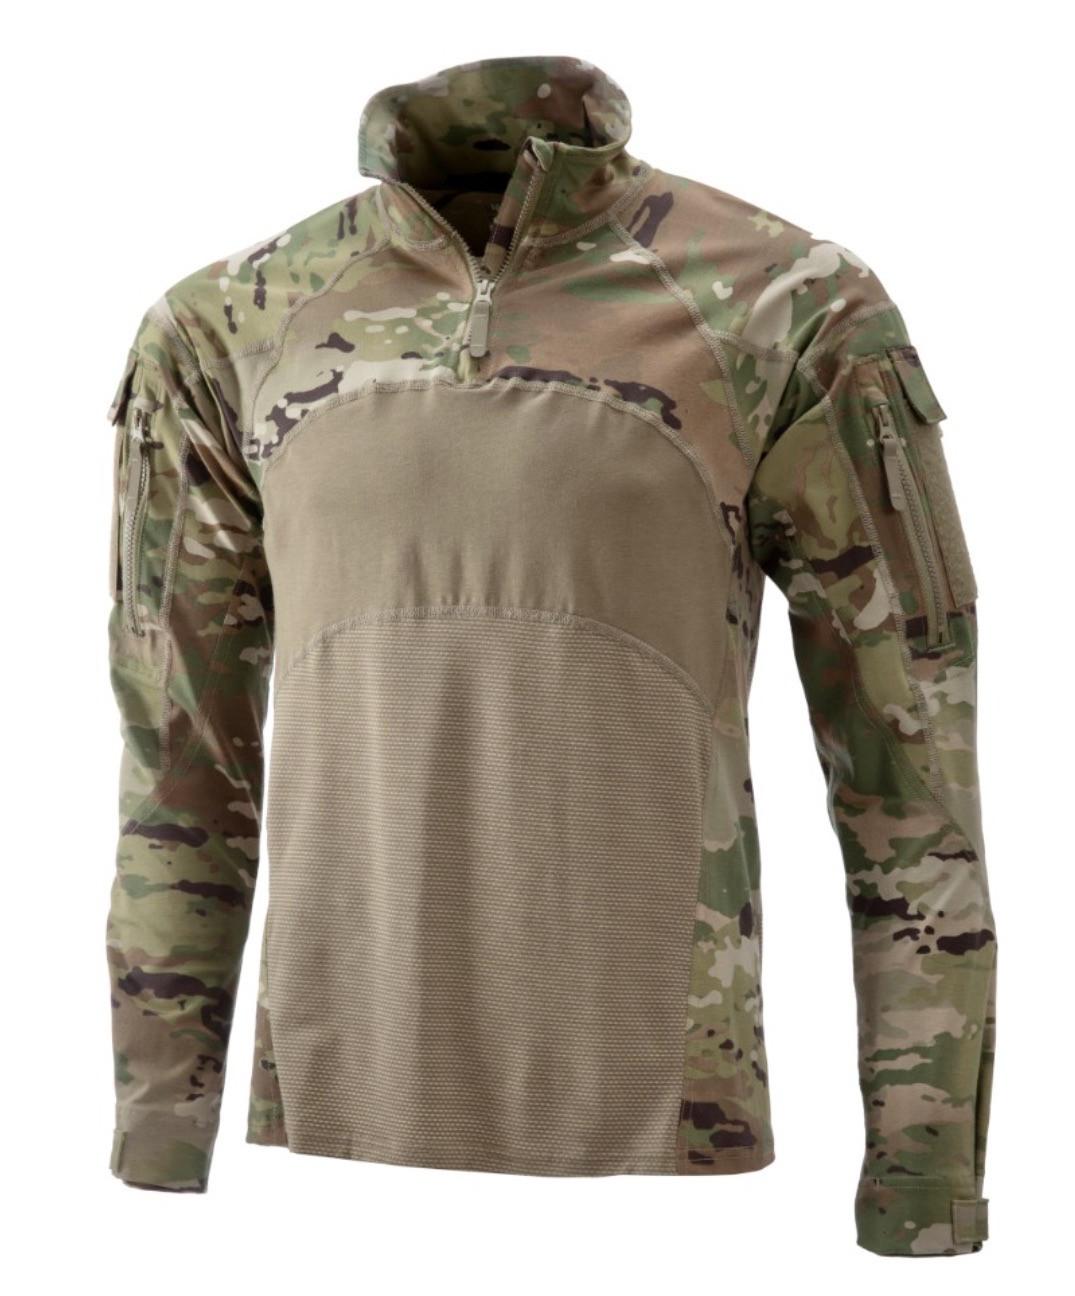 NWOT ARMY OCP COMBAT SHIRT HOT WEATHER LONG SLEEVE X-SMALL 1//4 ZIPPER FR TOP ACS